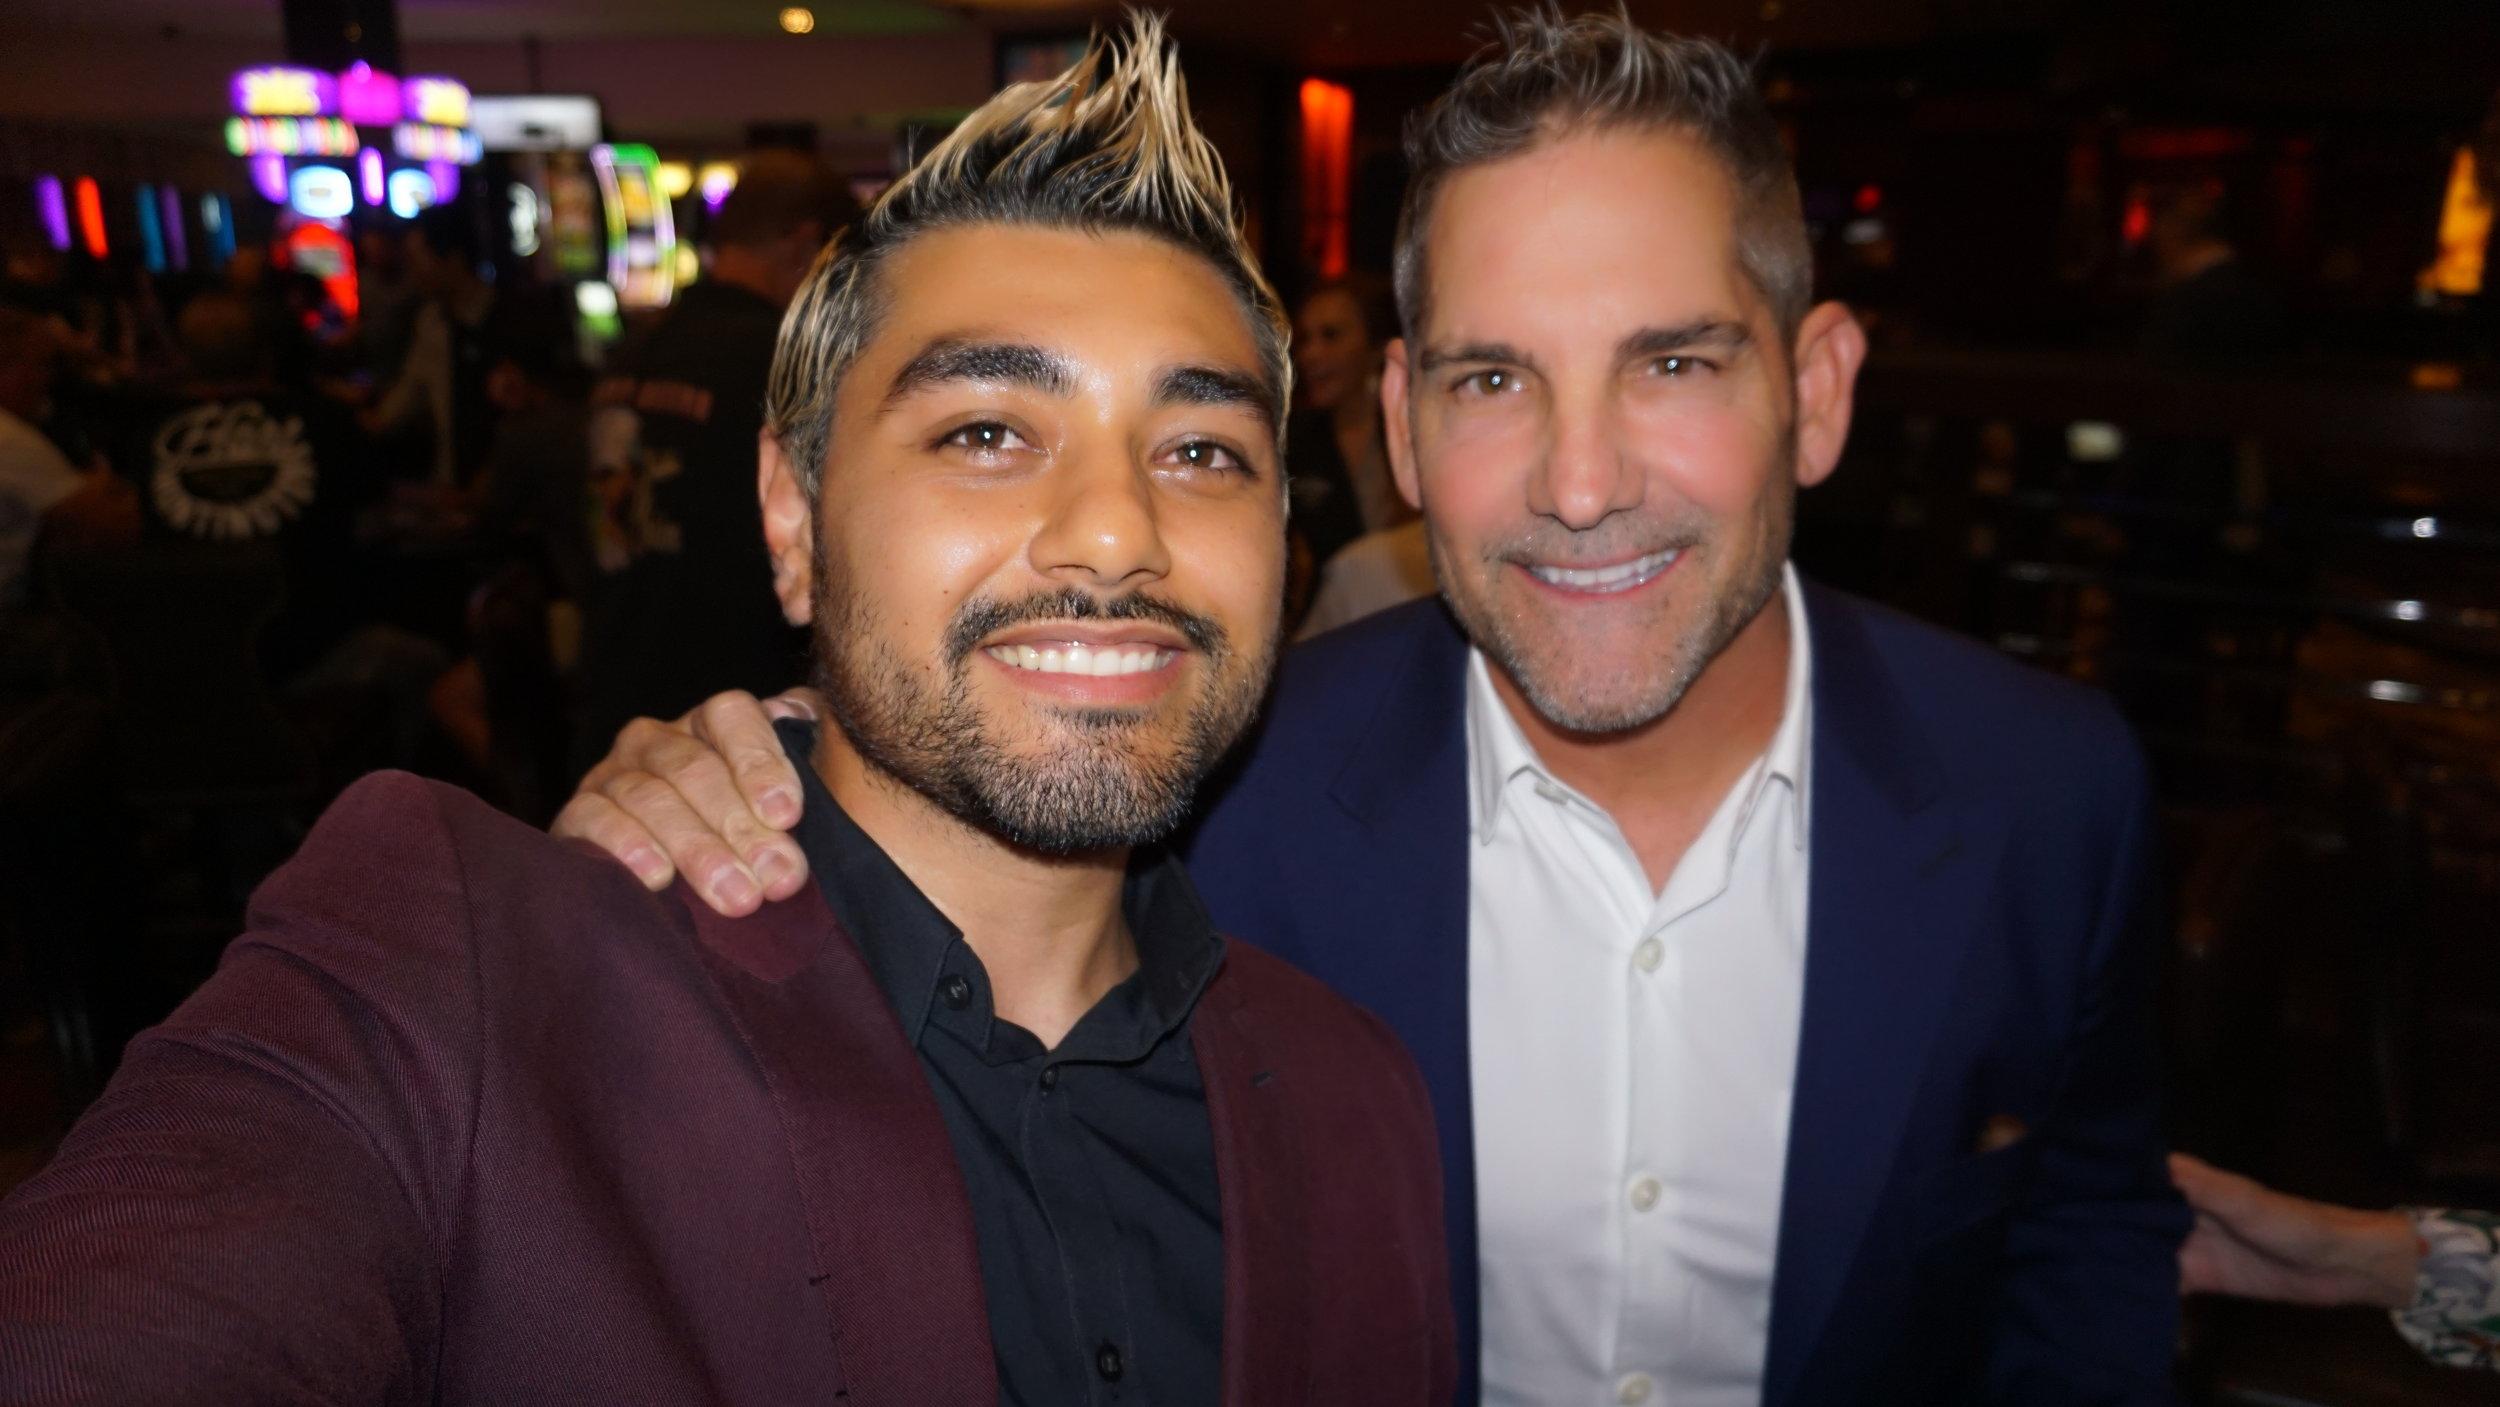 Manny with Grant Cardone.JPG